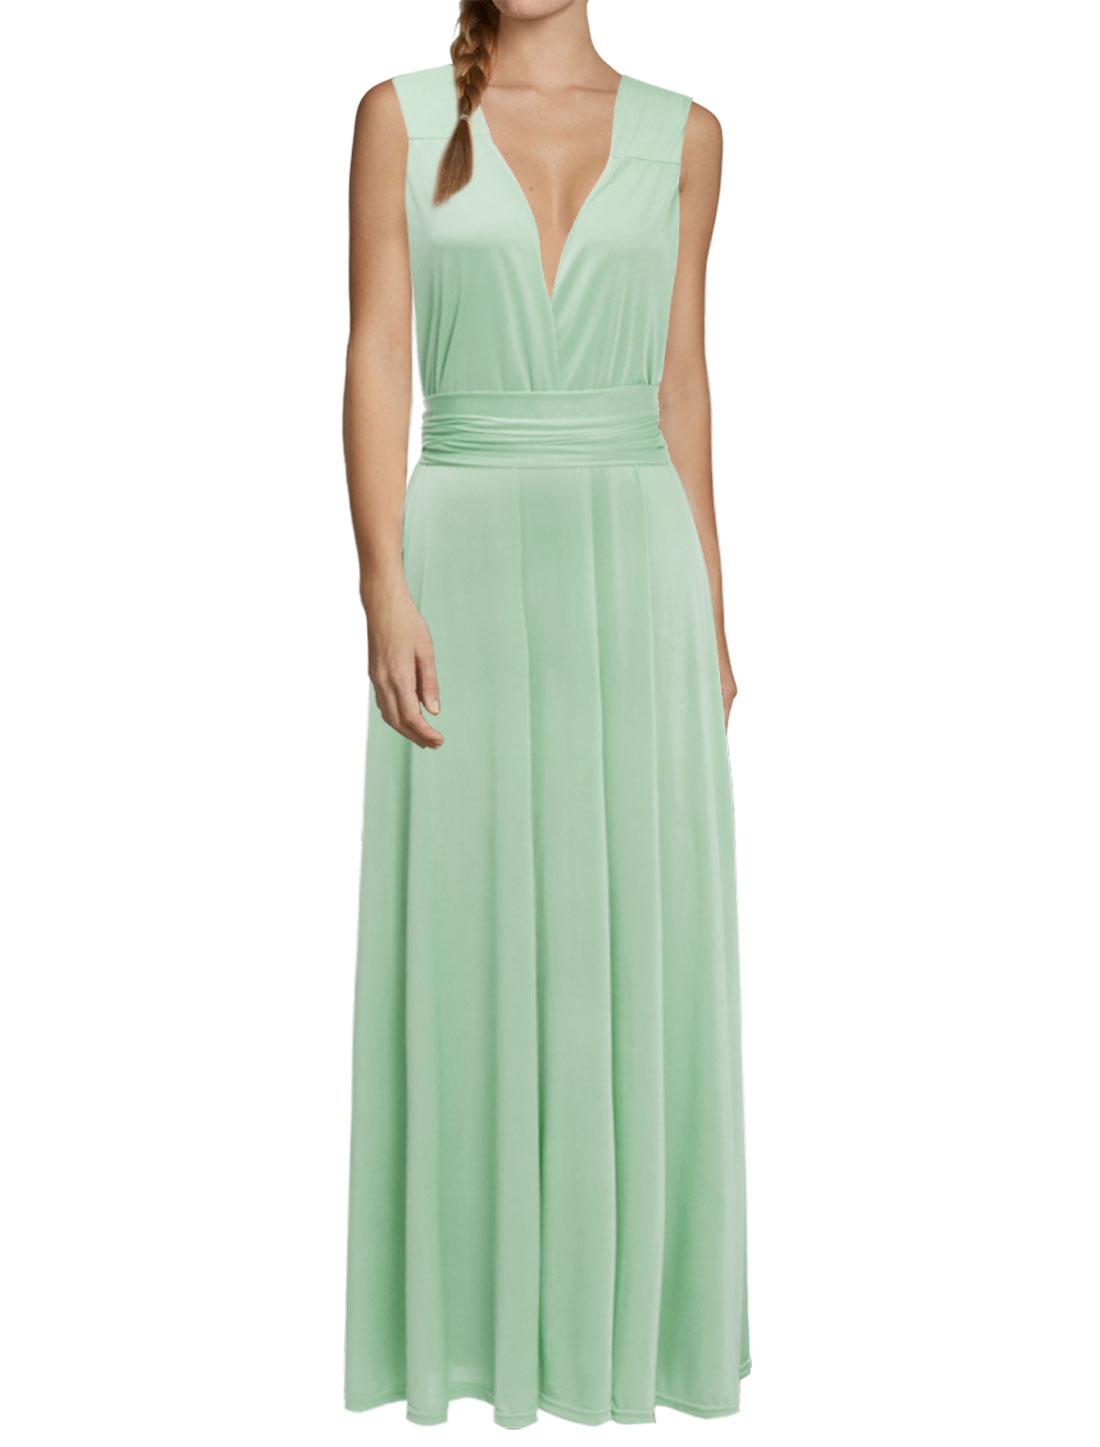 Women Crossover V Neck Self-Tie Multi-Way Wearing Maxi Dress Green S